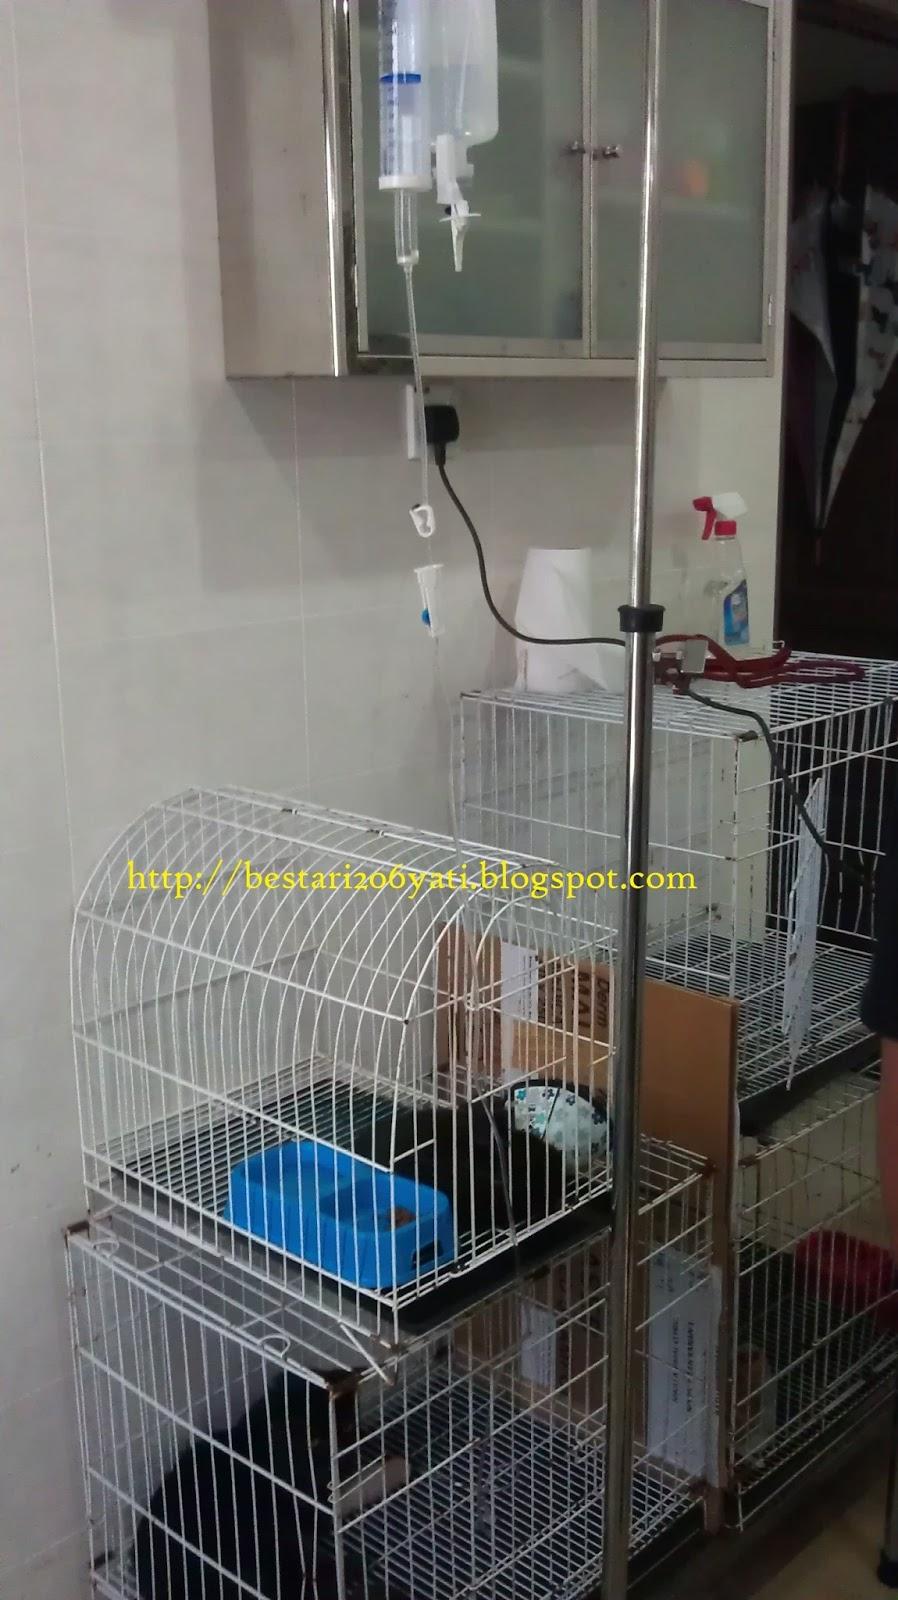 Ubat Kucing Kena Cacing Cintamanisz Lite Aksi Shin Kucing